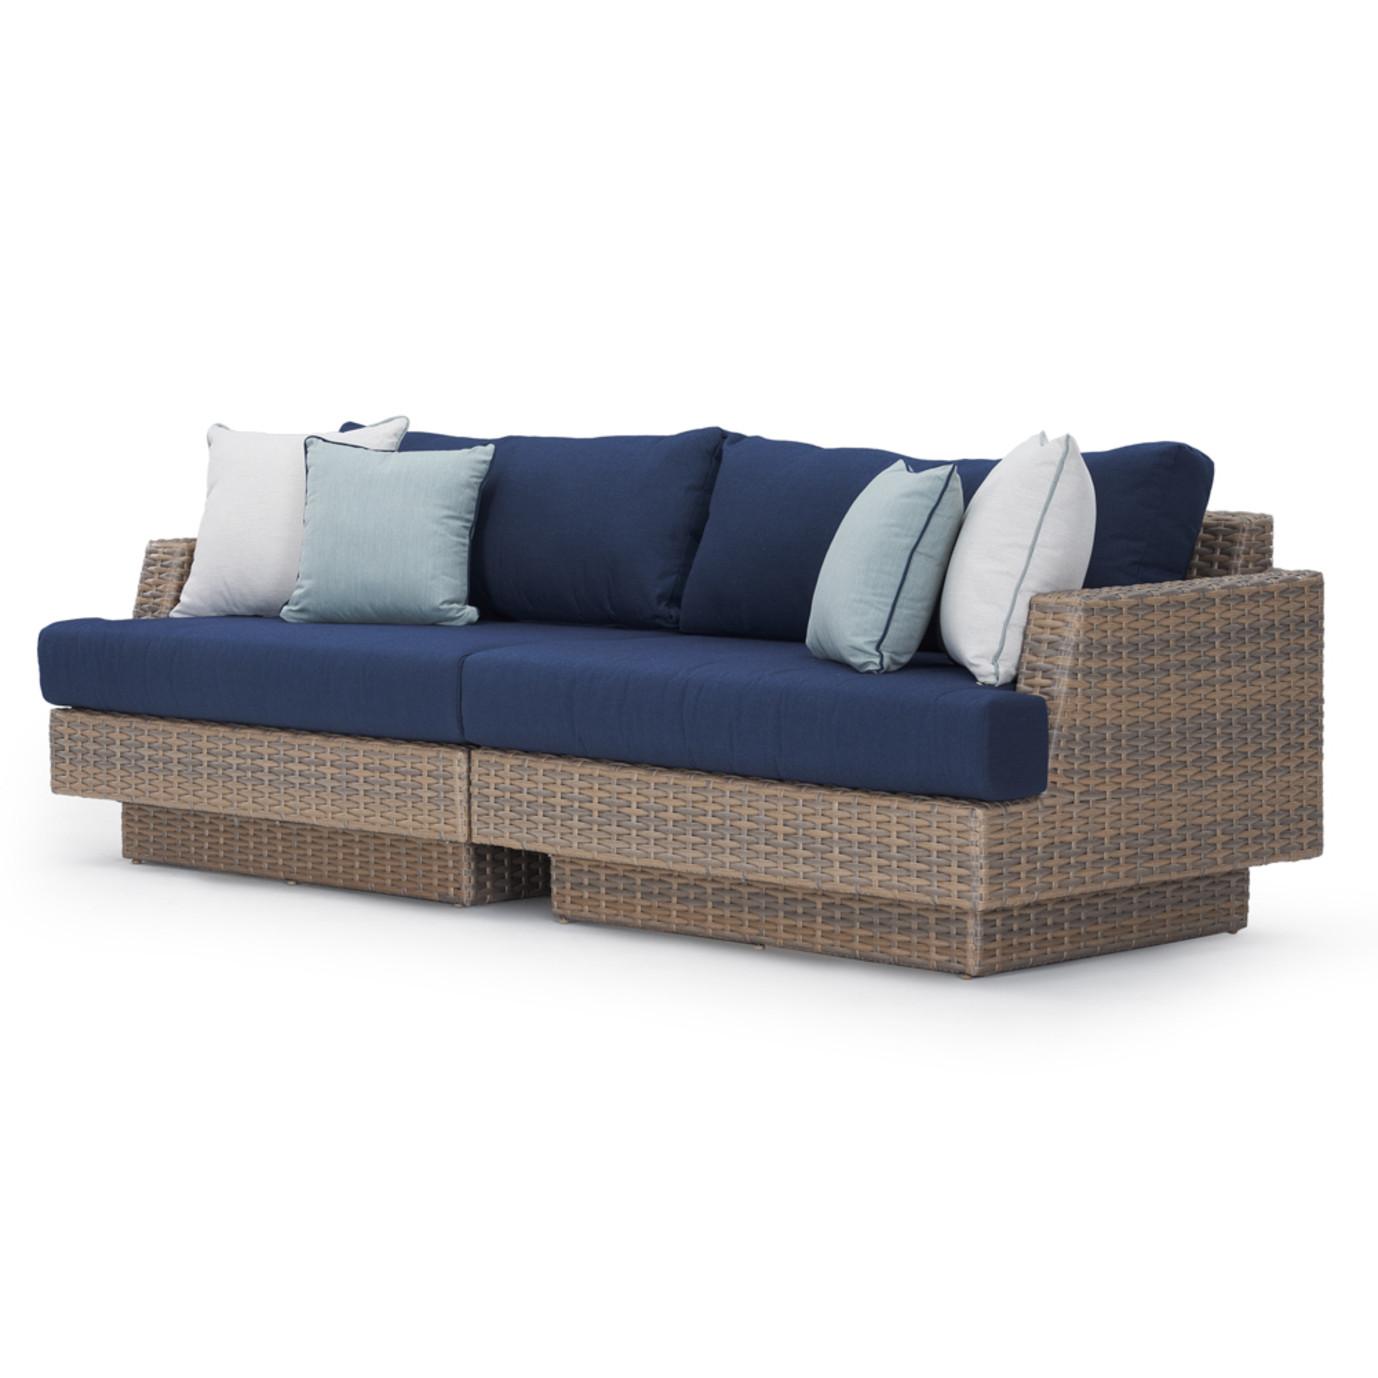 Portofino Repose 96in Sofa - Laguna Blue